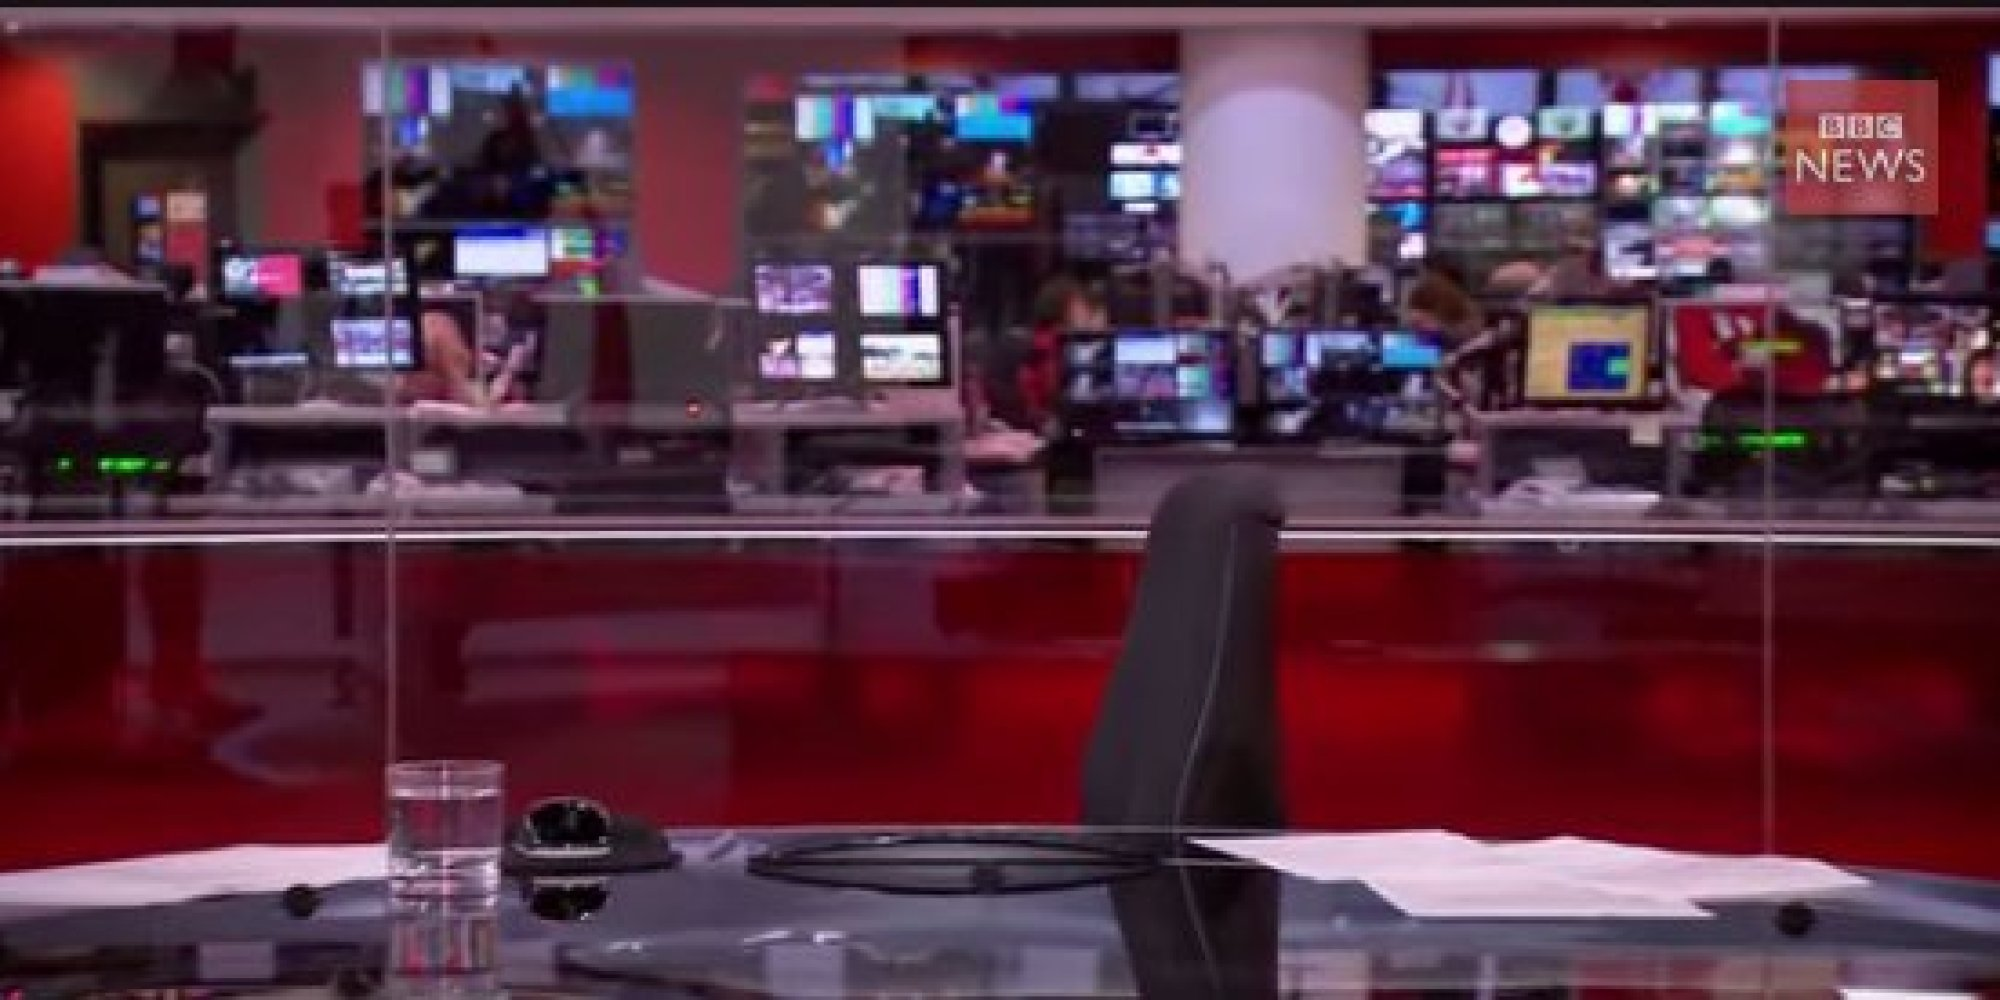 BBC News Photo: BBC News Presenter Martine Croxall Finds Herself In Front